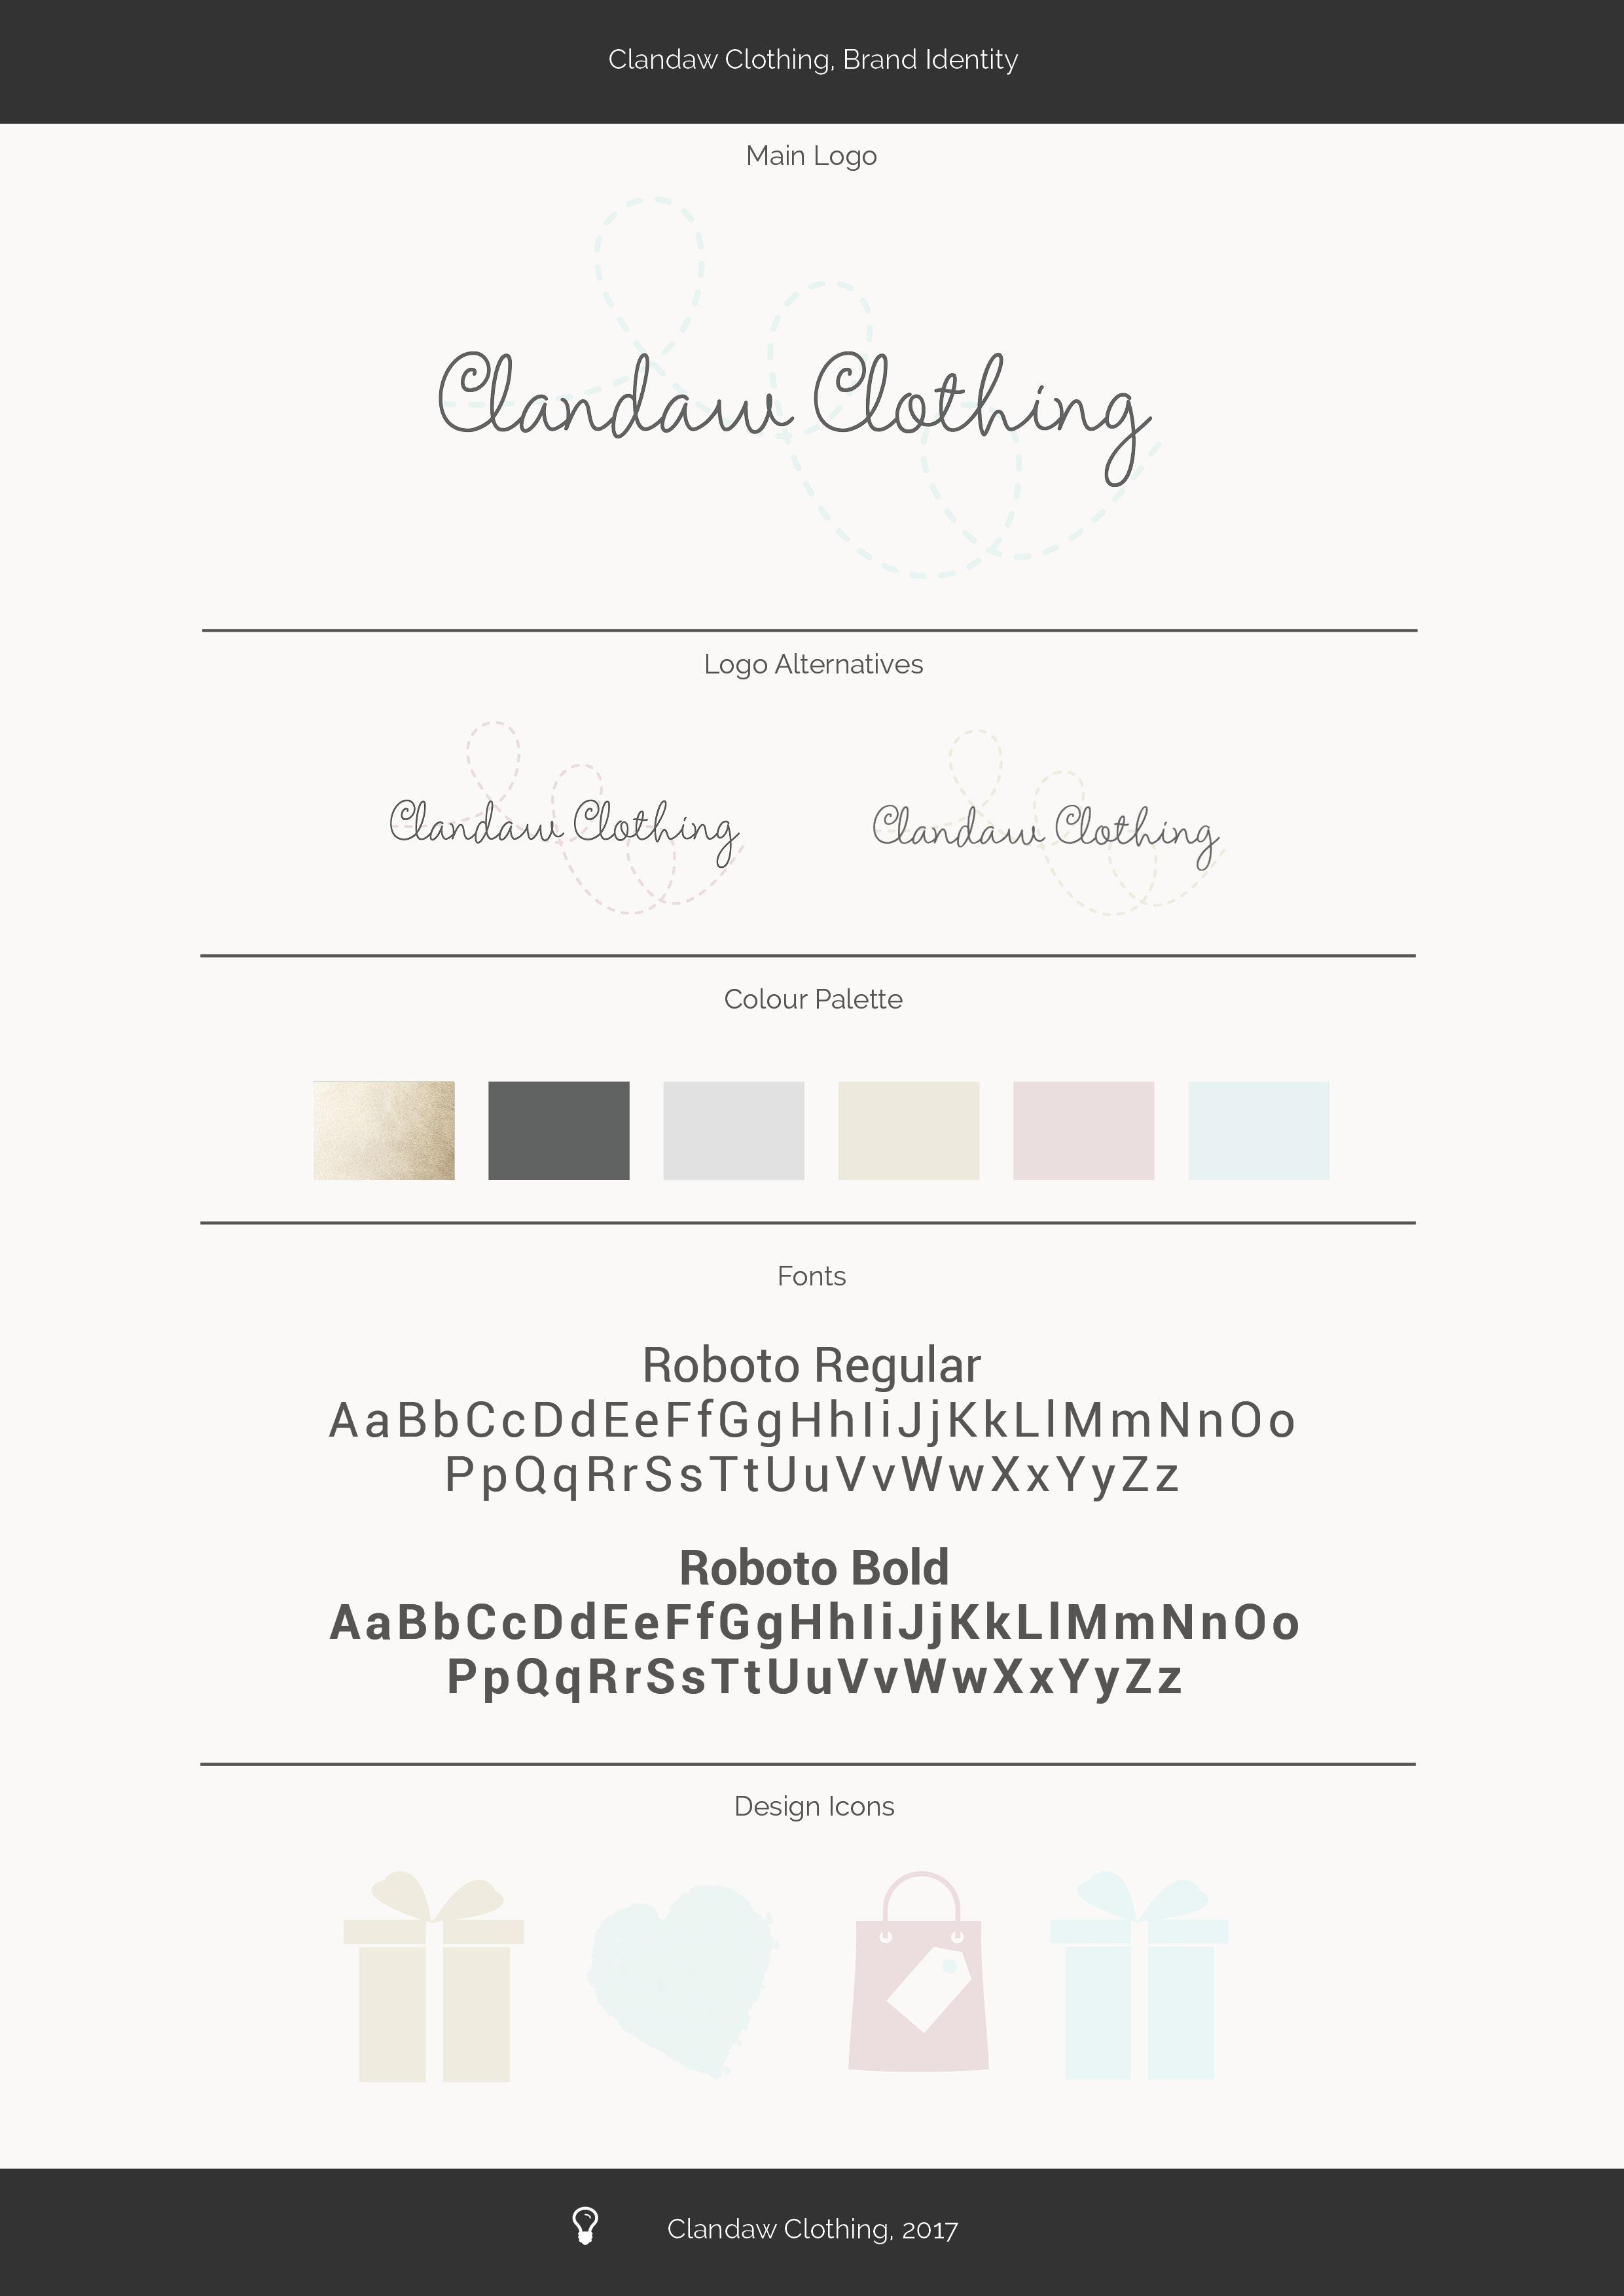 Clandaw Clothing Brand Identity